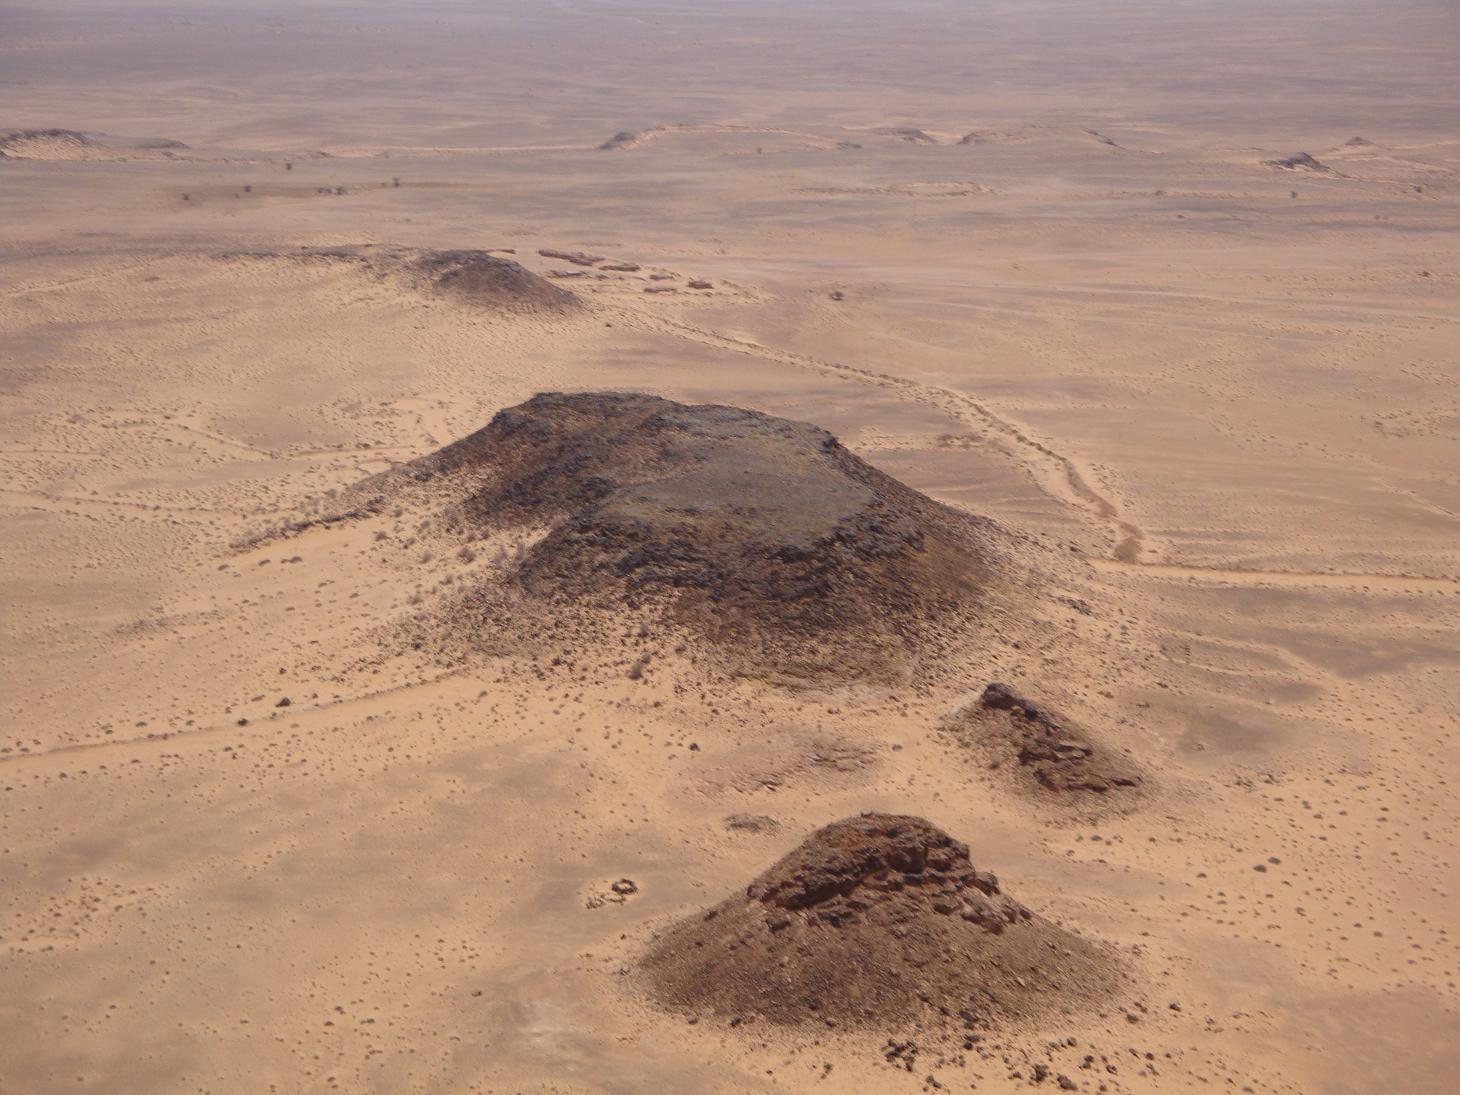 la ceinture de sécurité au sahara marocain - Page 14 3453695859_d2cb70e407_o